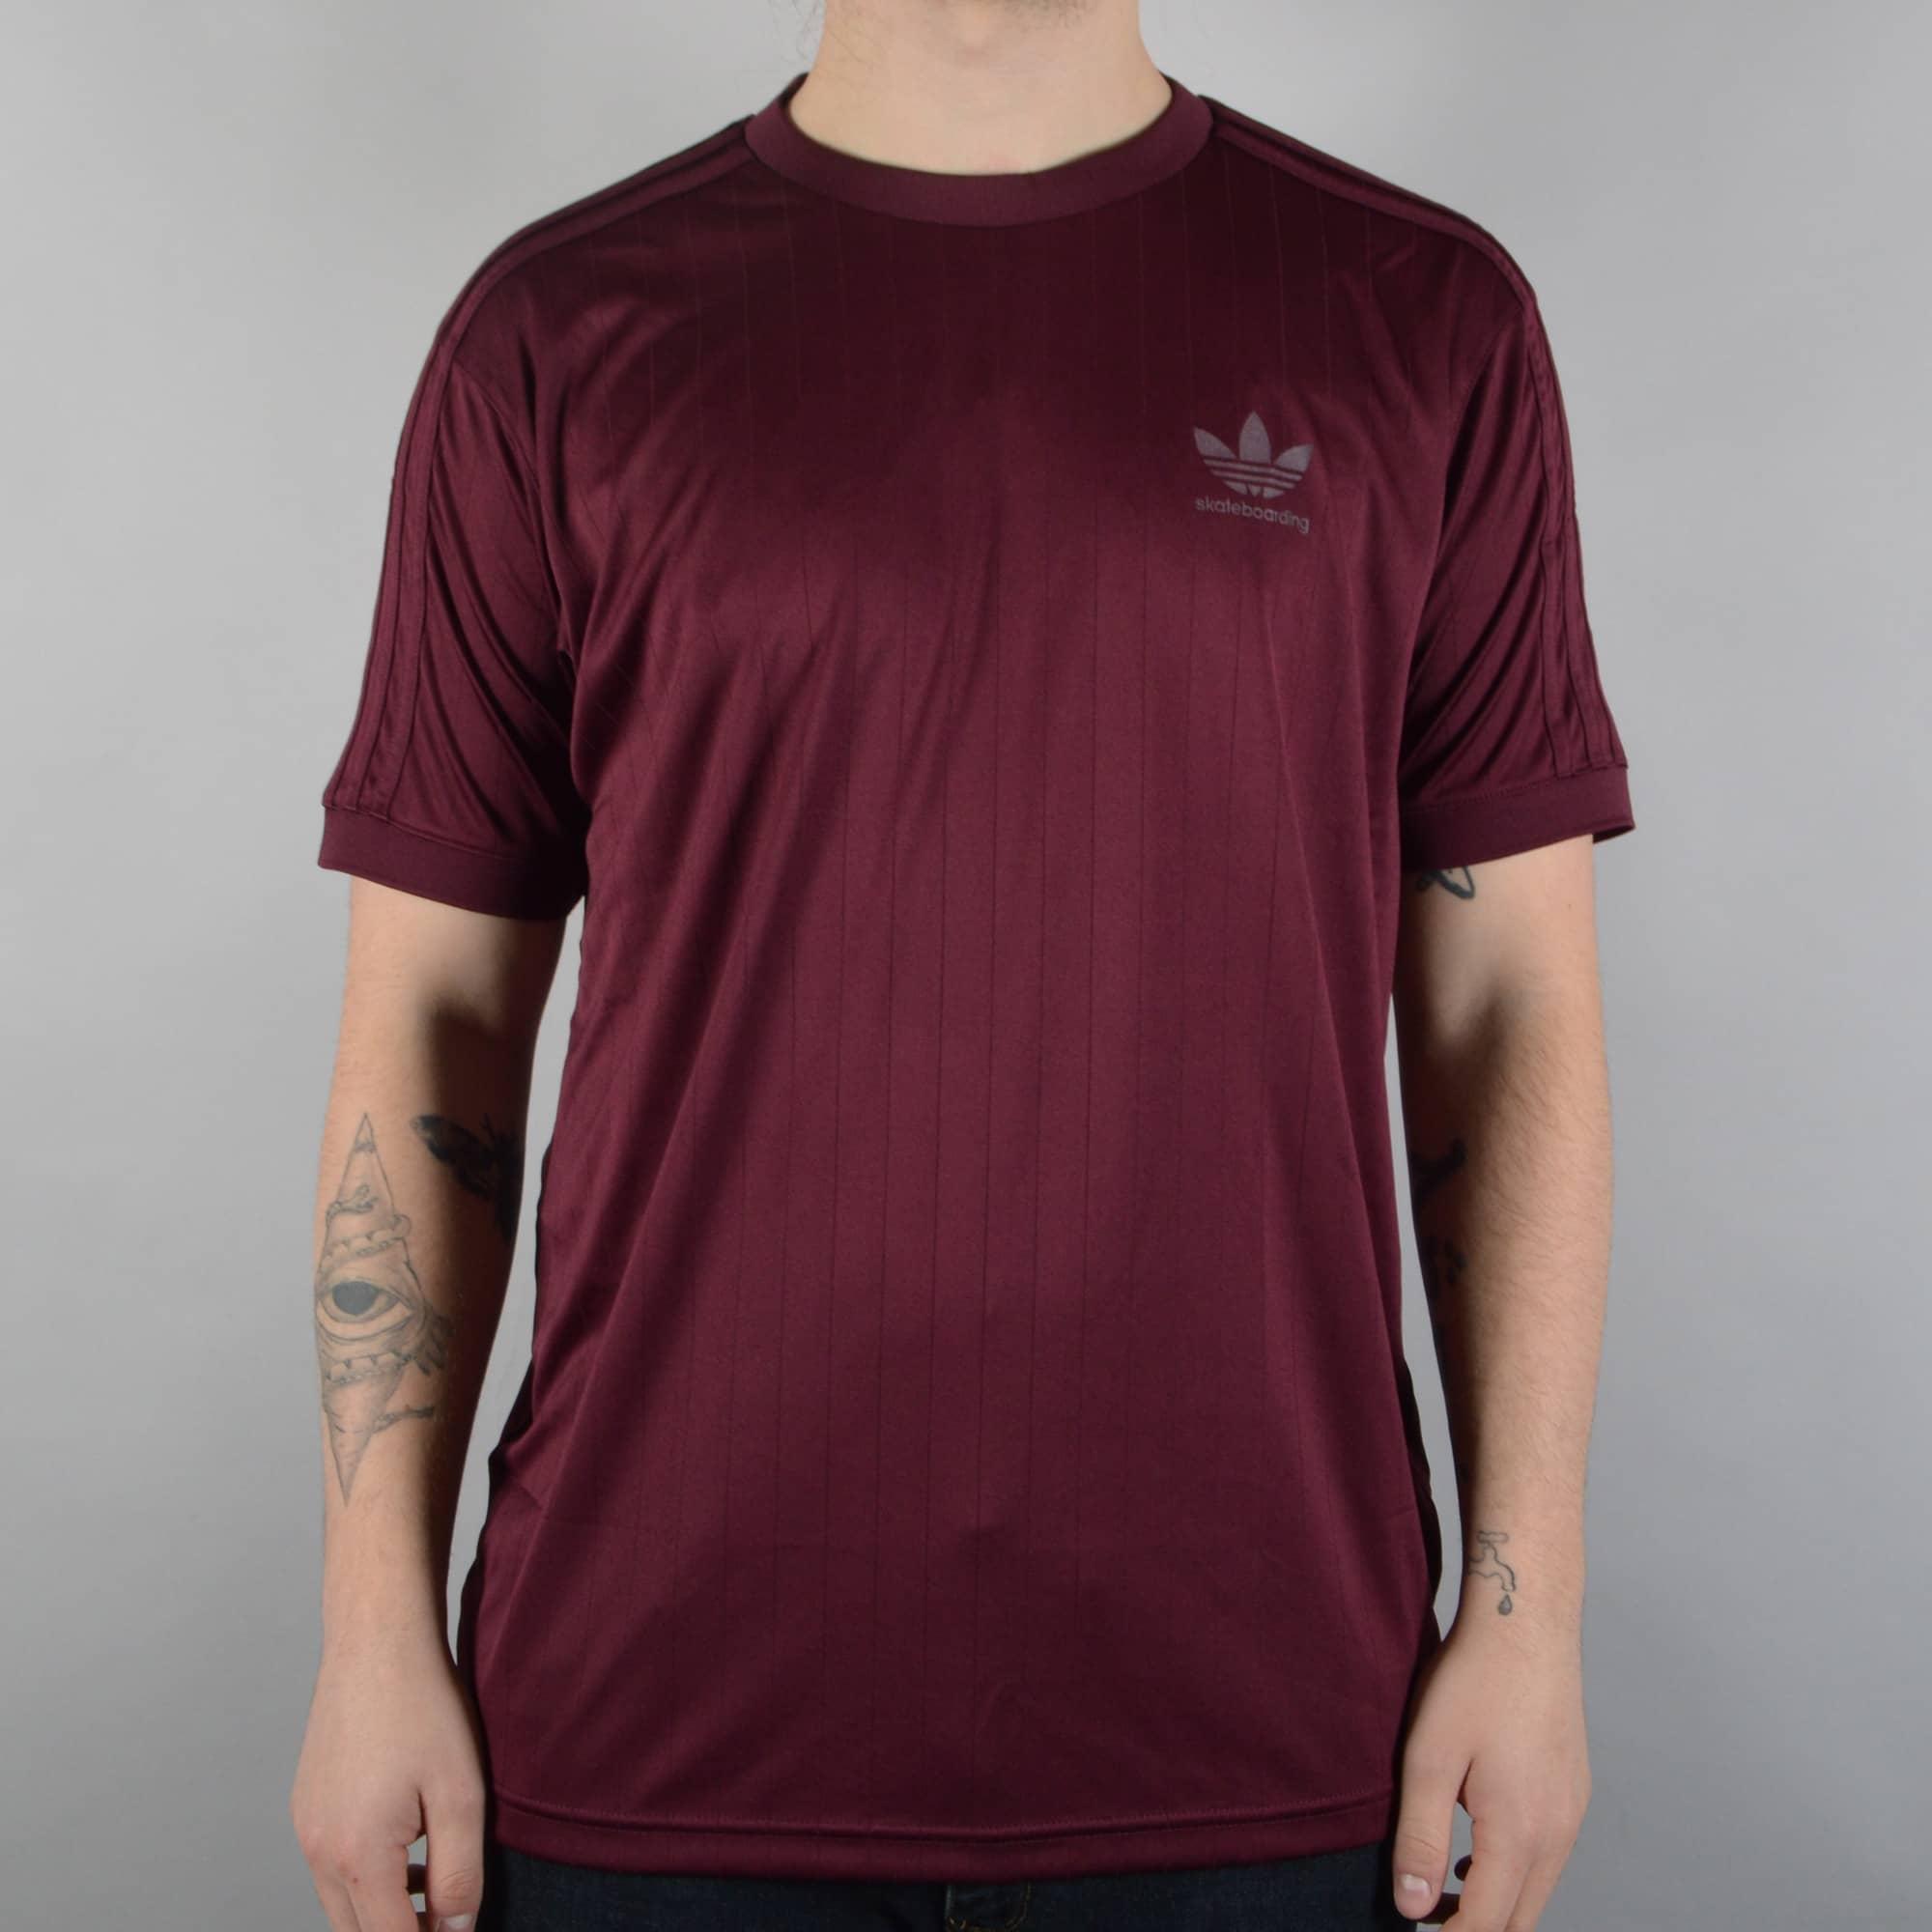 Adidas Skateboarding Clima Club Jersey Skate T-Shirt - Maroon/Gold